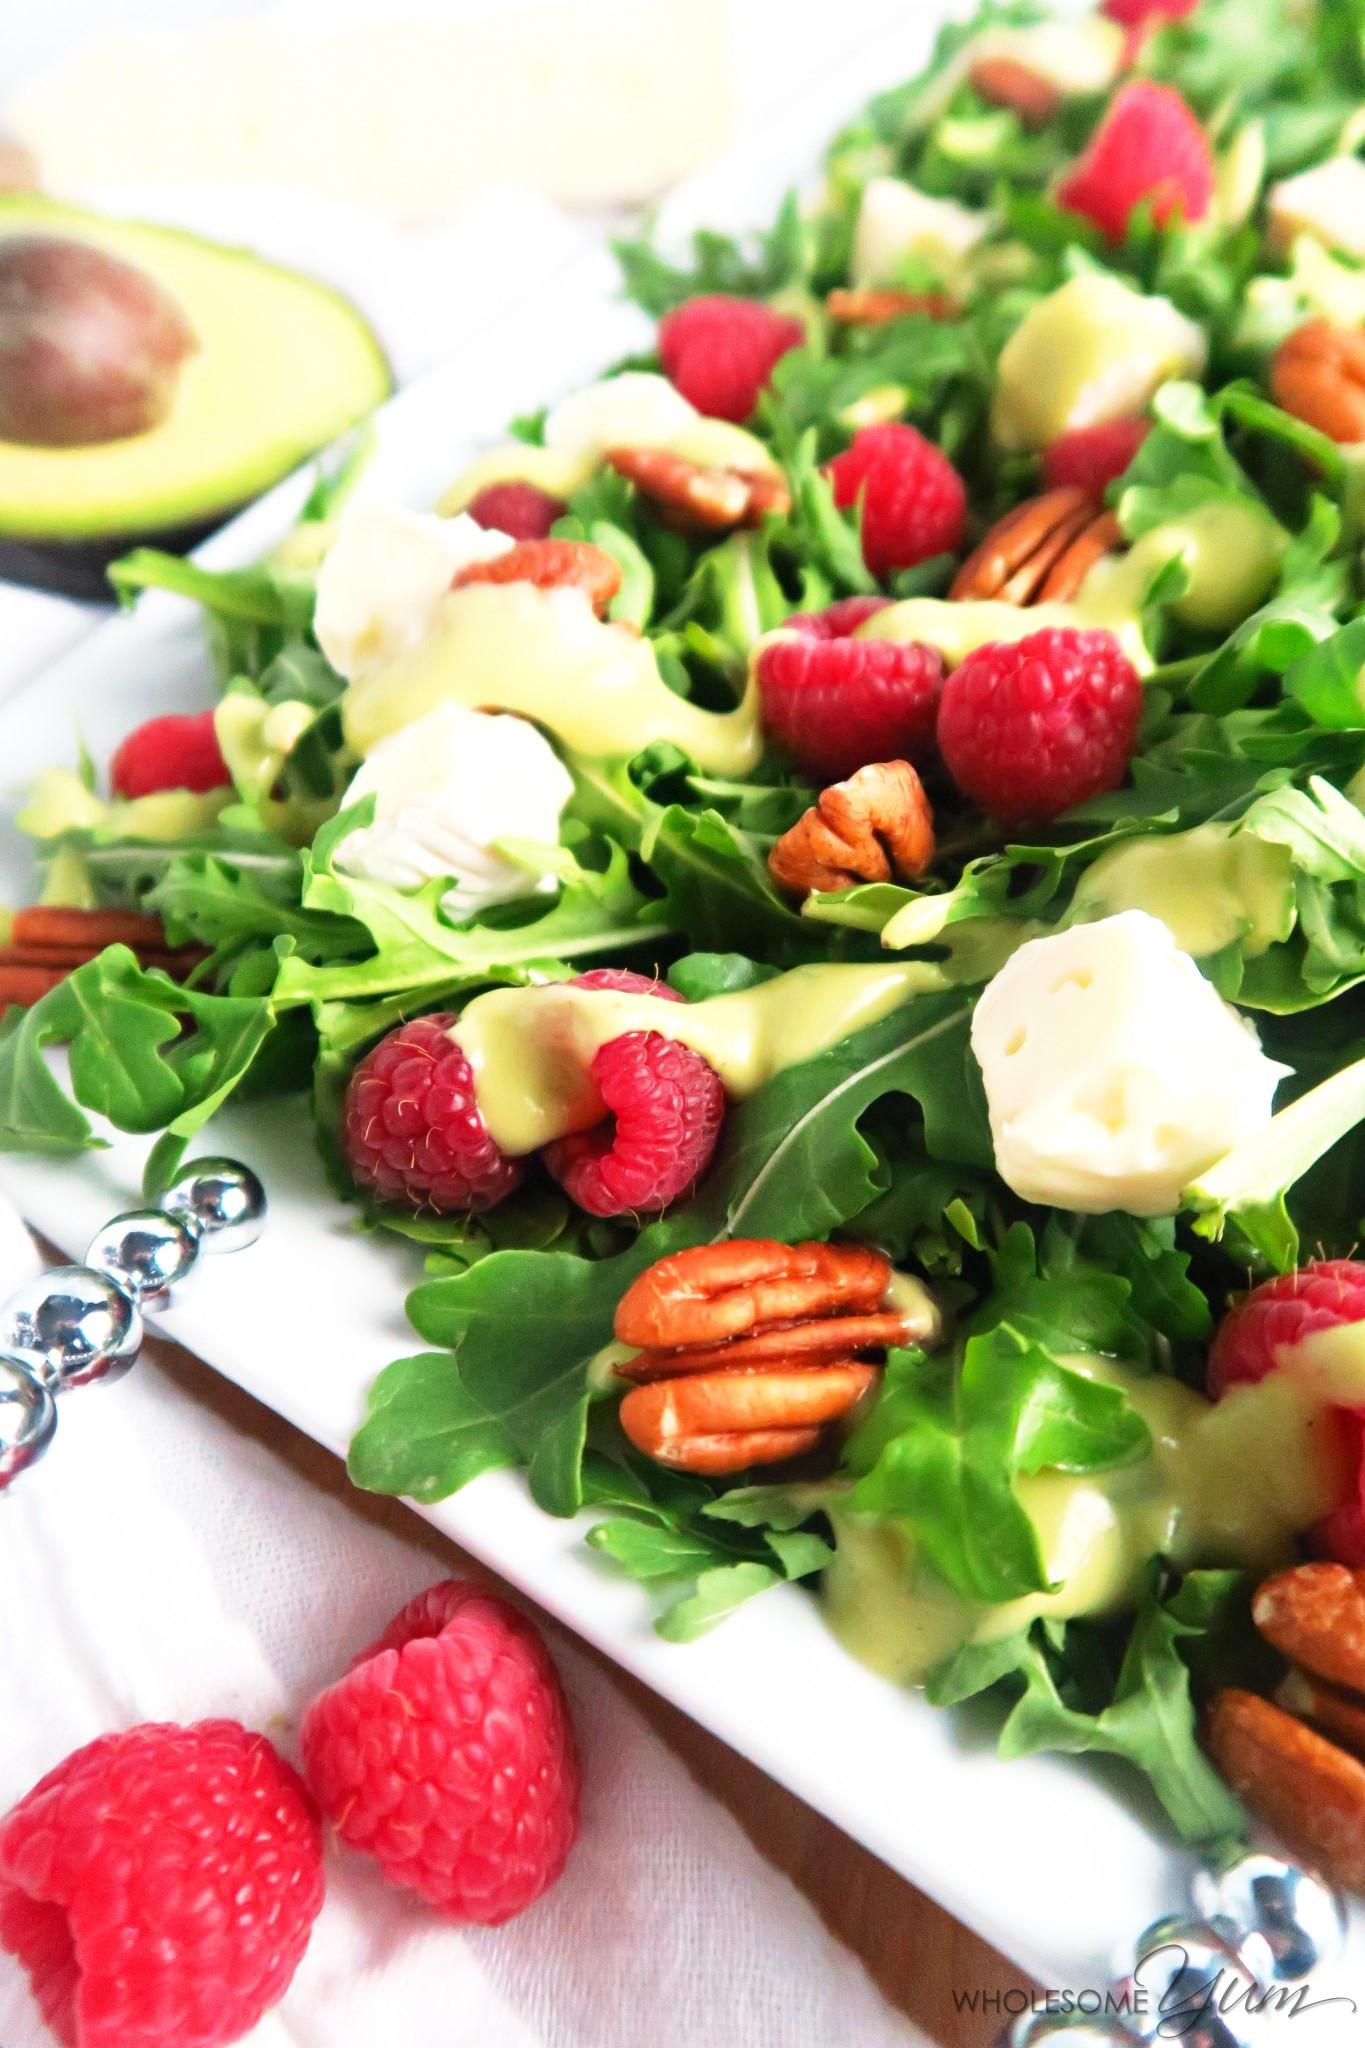 Healthy Summer Recipes For Dinner  Healthy Summer Dinner Recipes July Meal Plan Rainbow